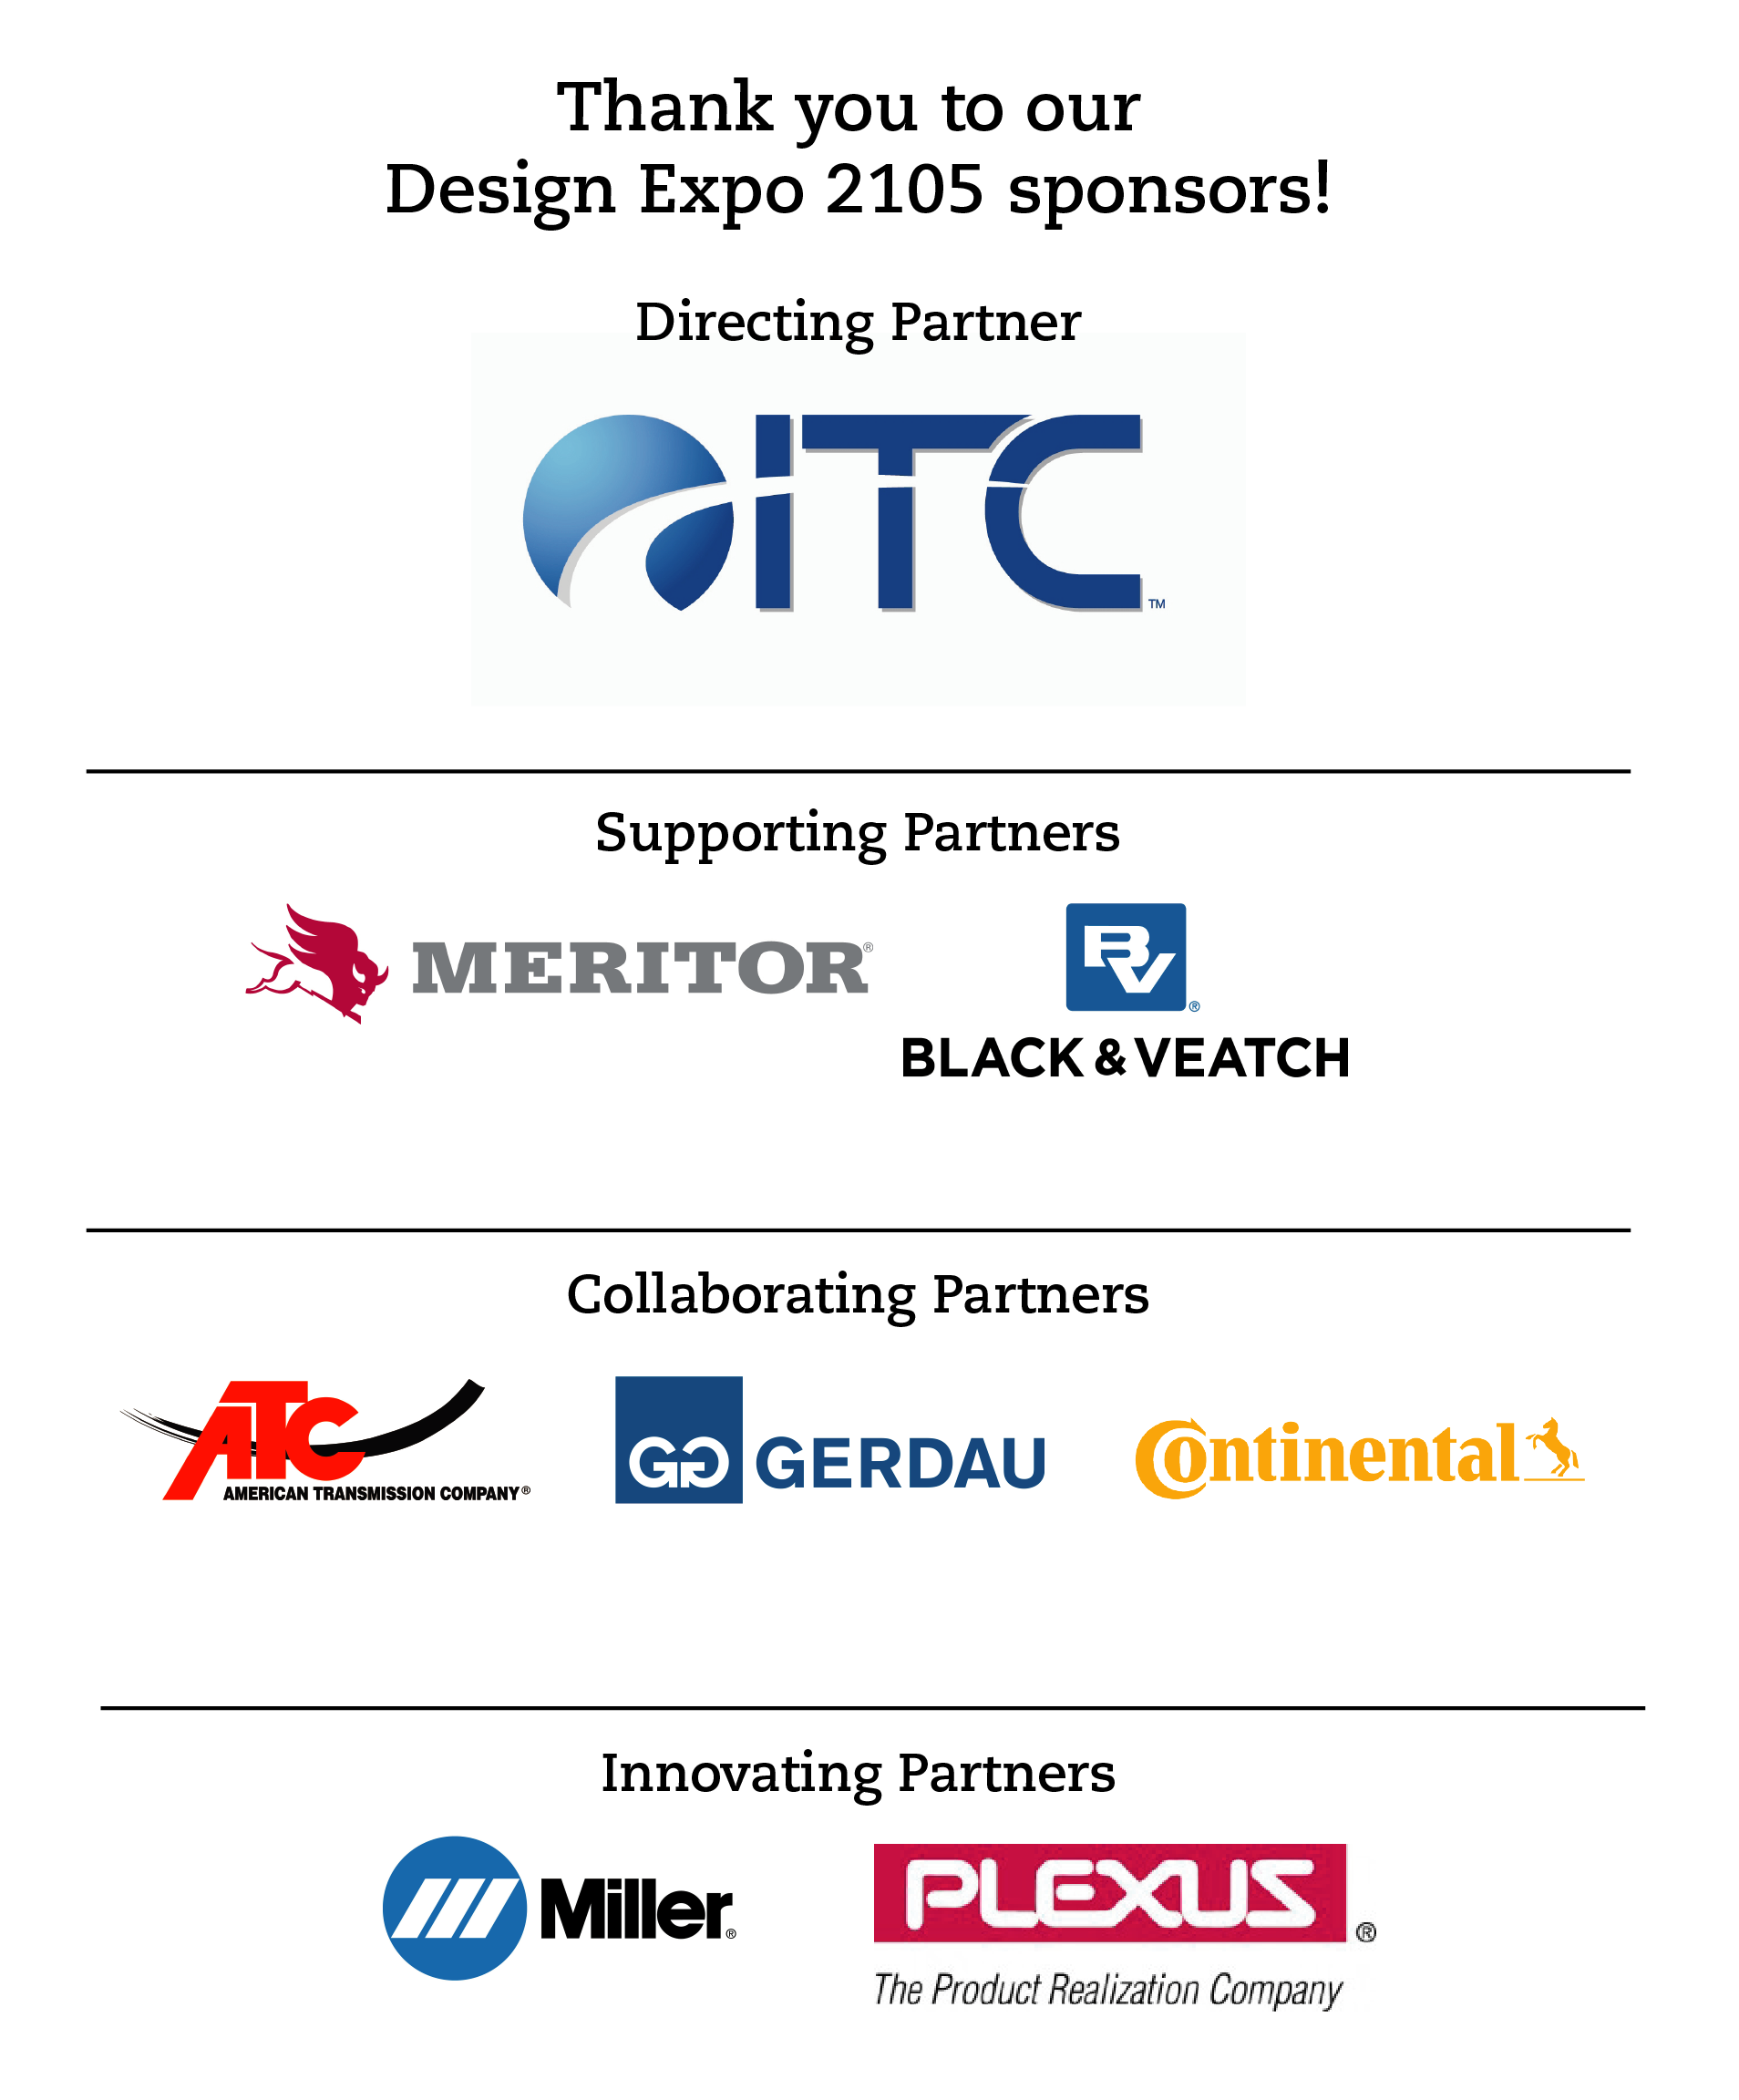 Design Expo 2015 event sponsors